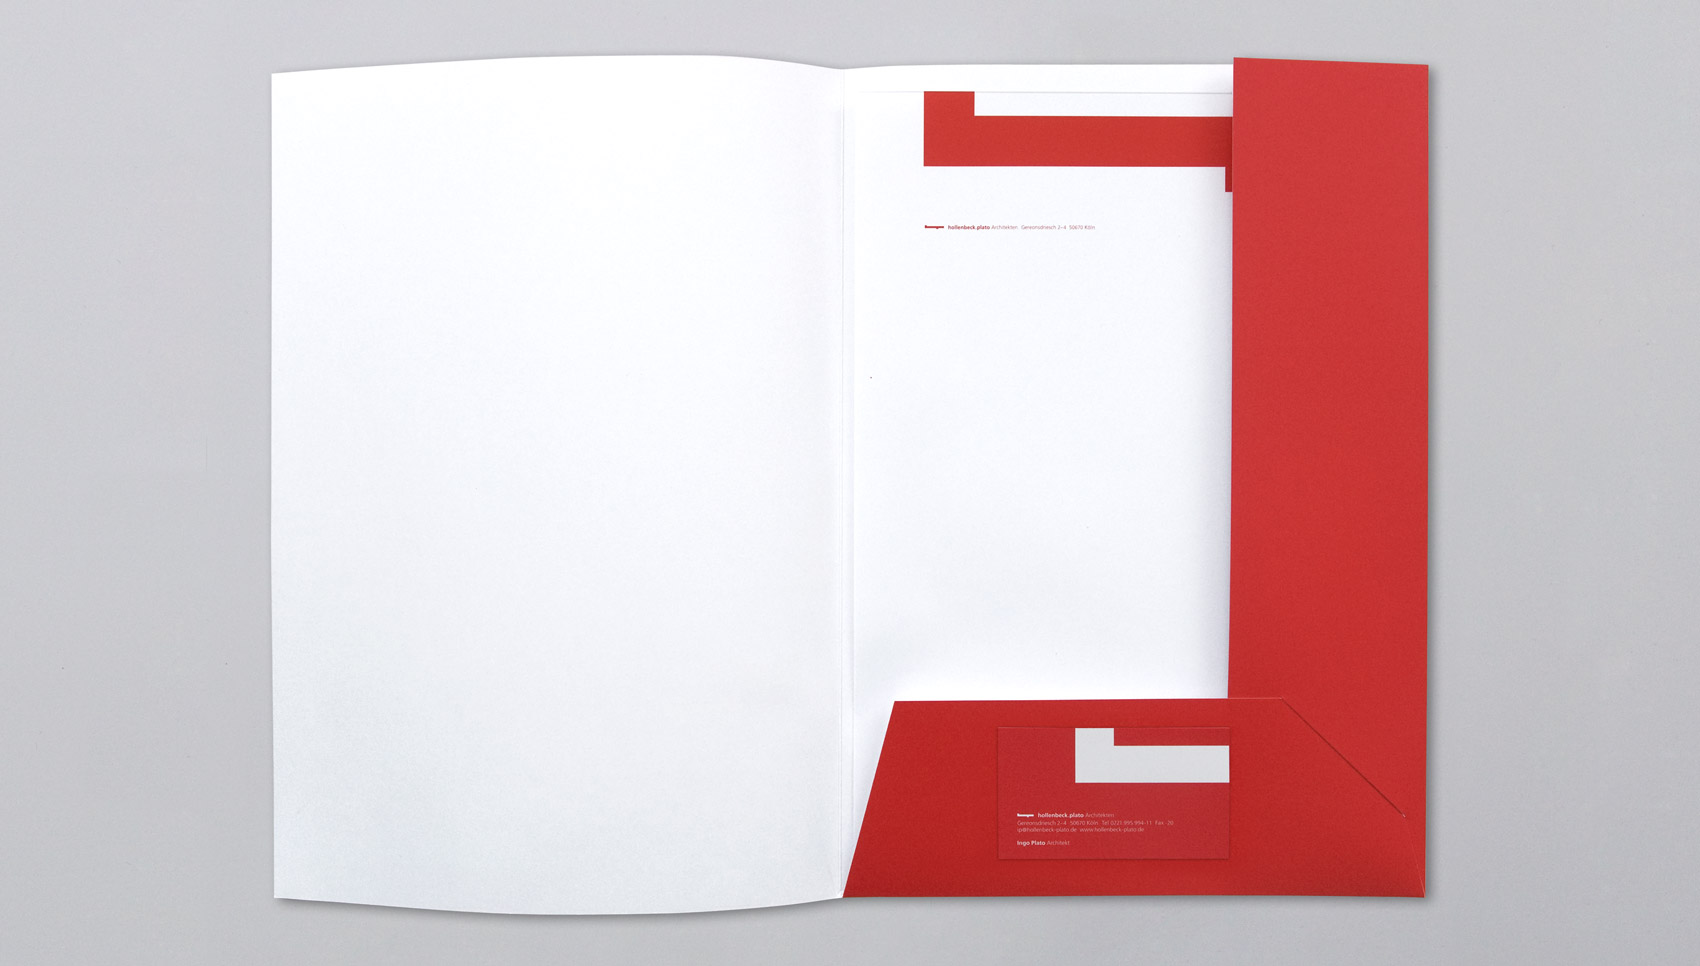 hollenbeck.plato Corporate Design